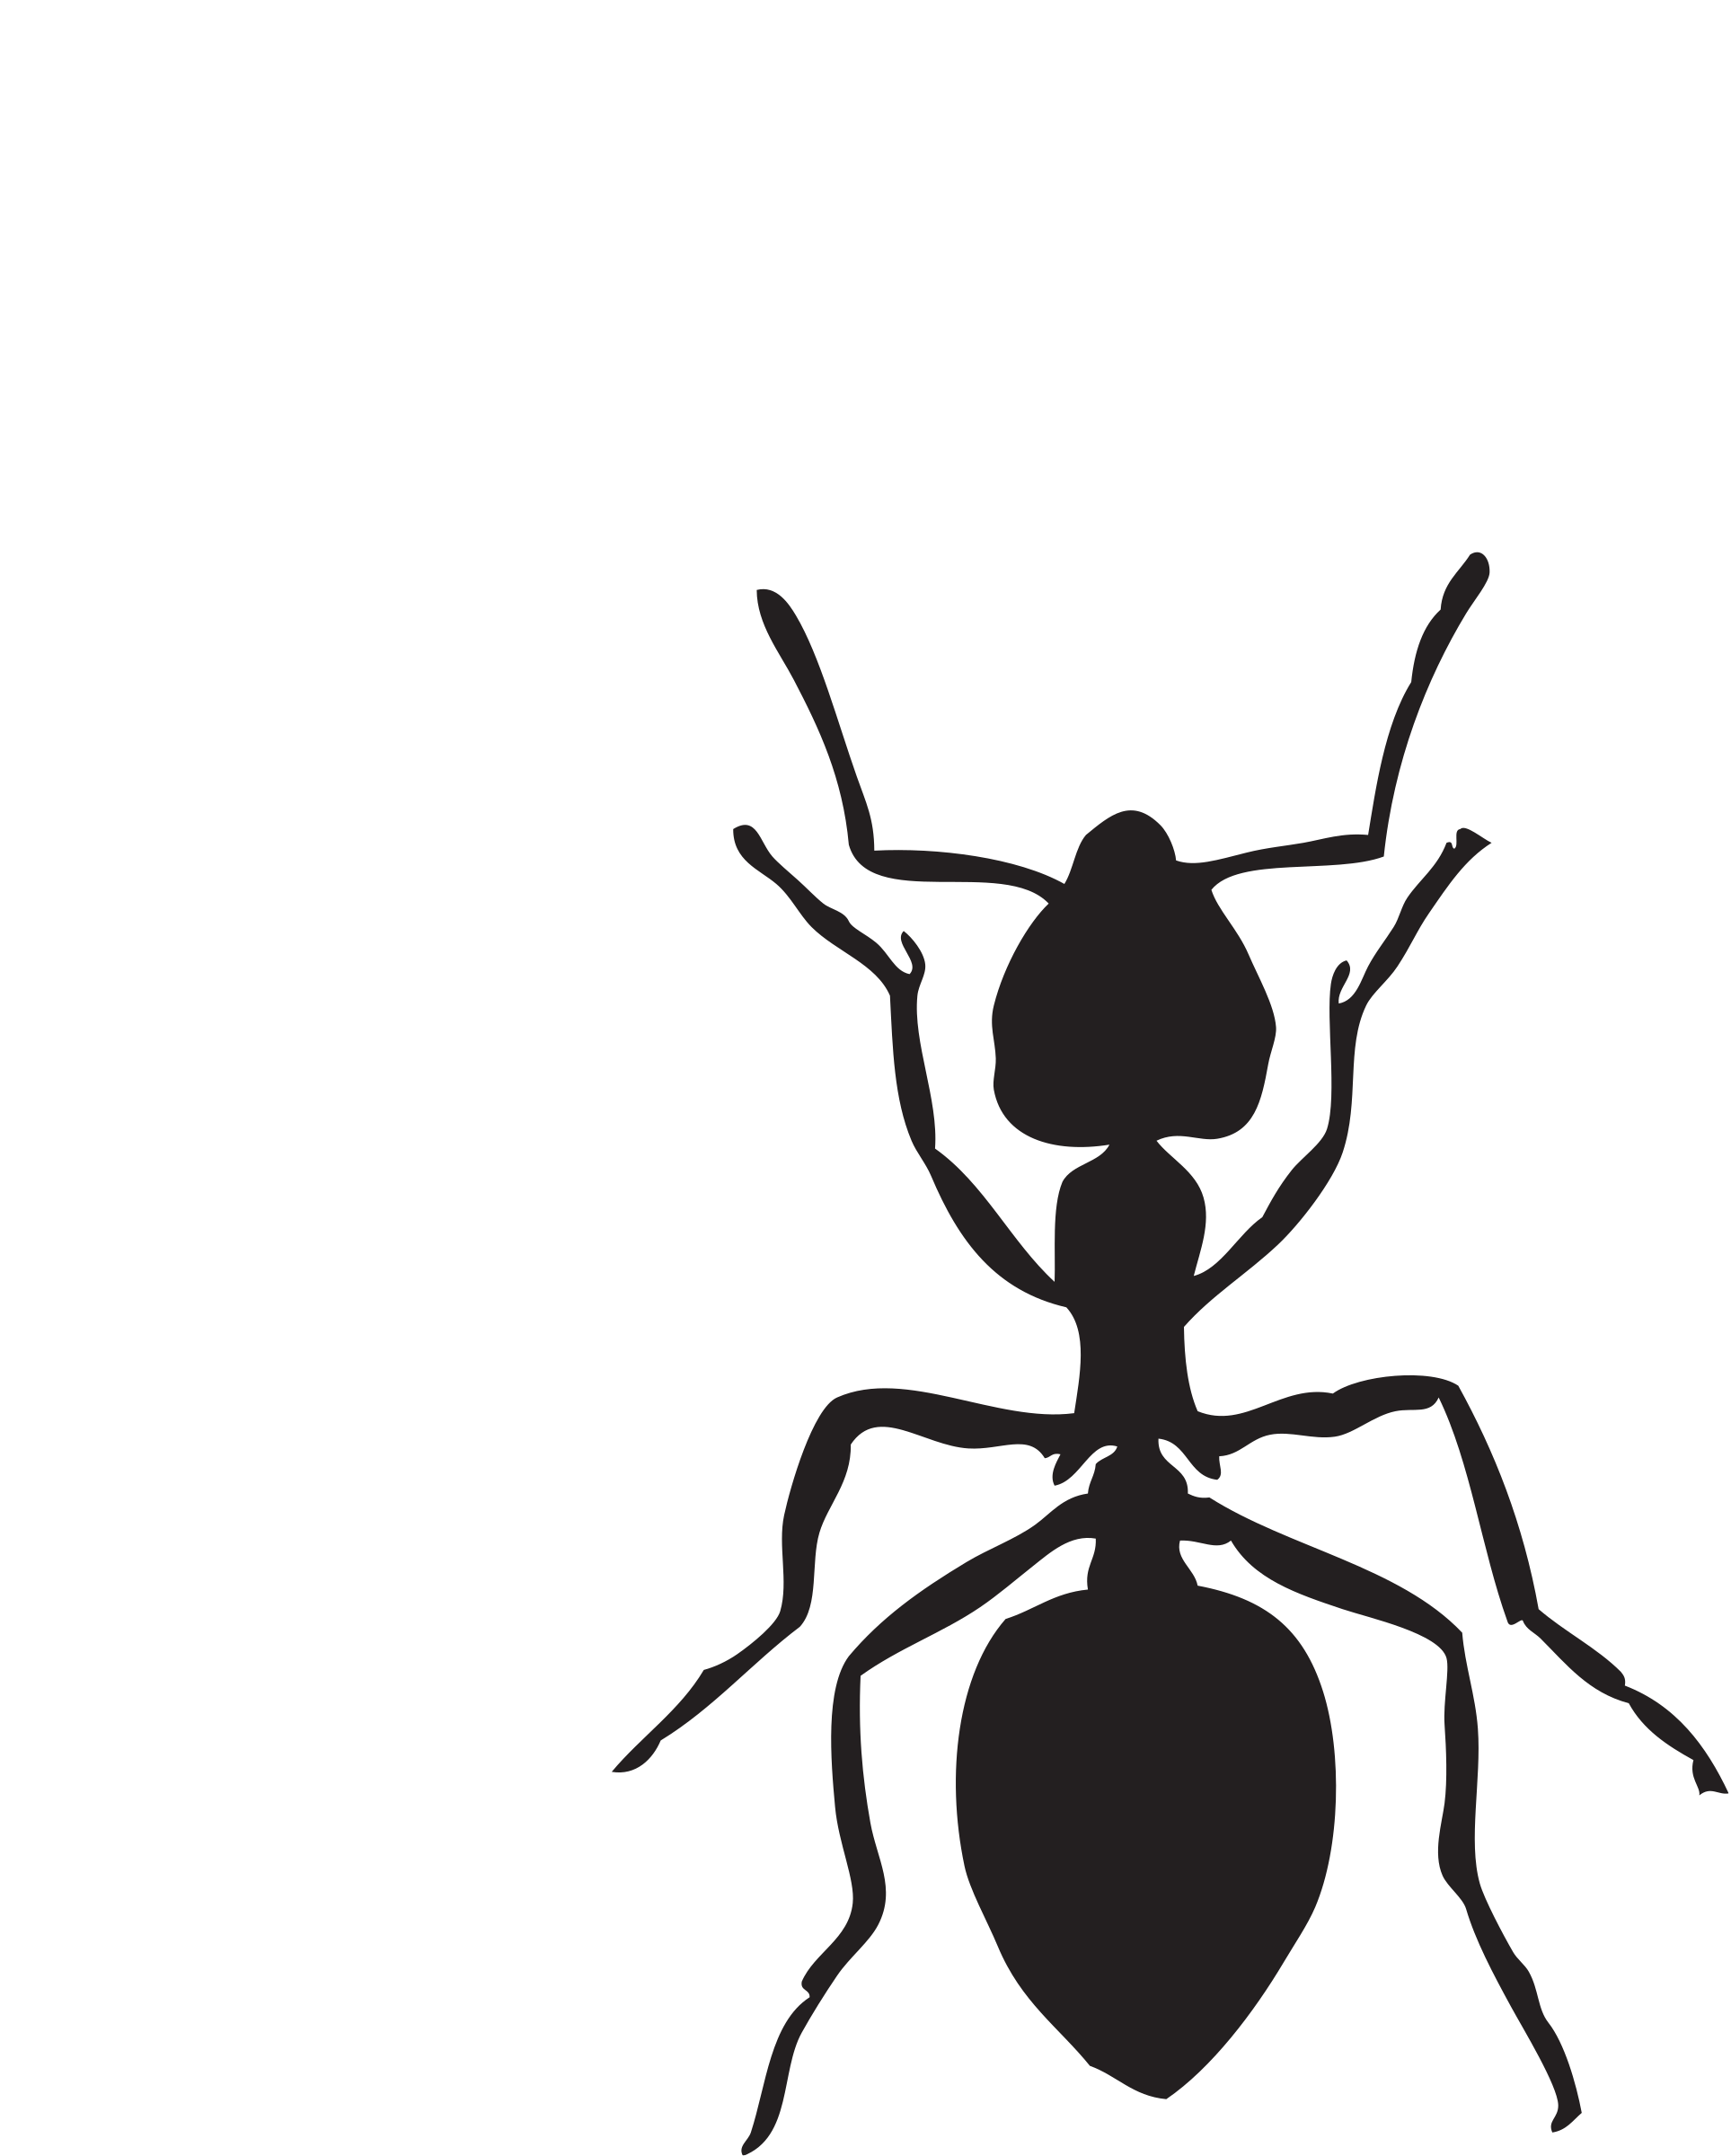 Ant clipart body. Acrobat big image png